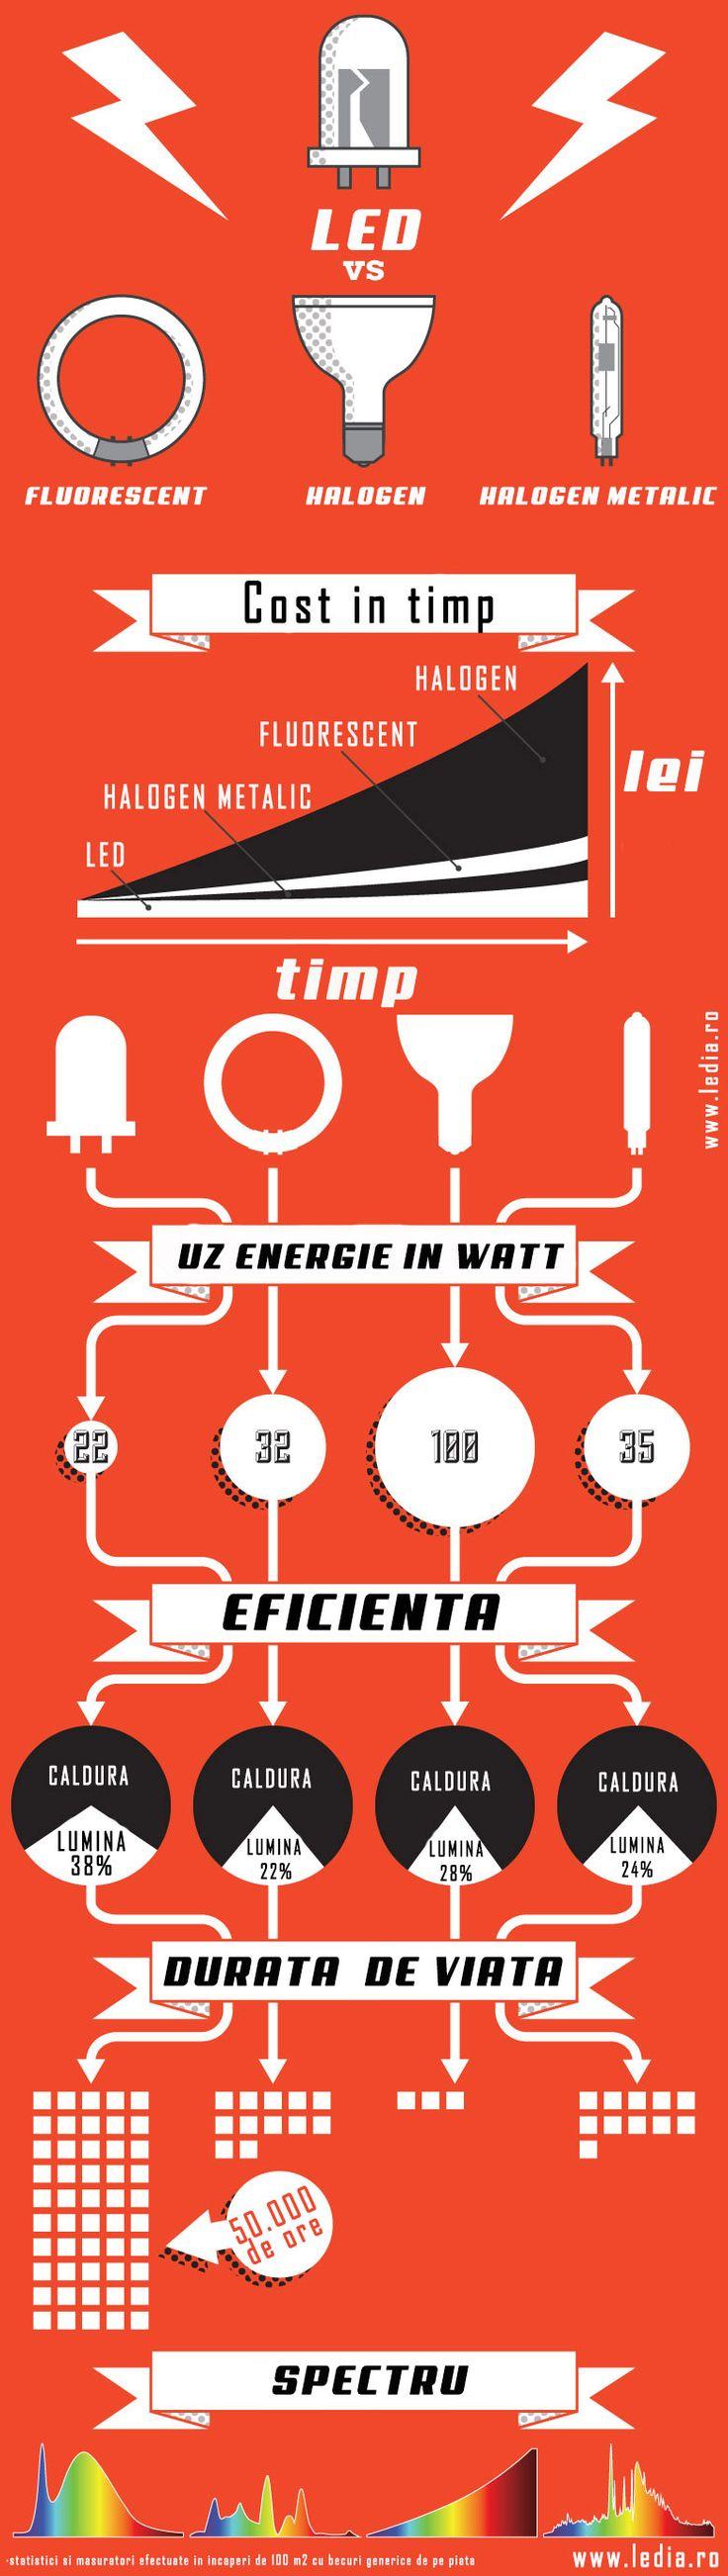 ingrafie comparatie tipuri de led led halogen si fluorescent pe blogul www.ledia.ro